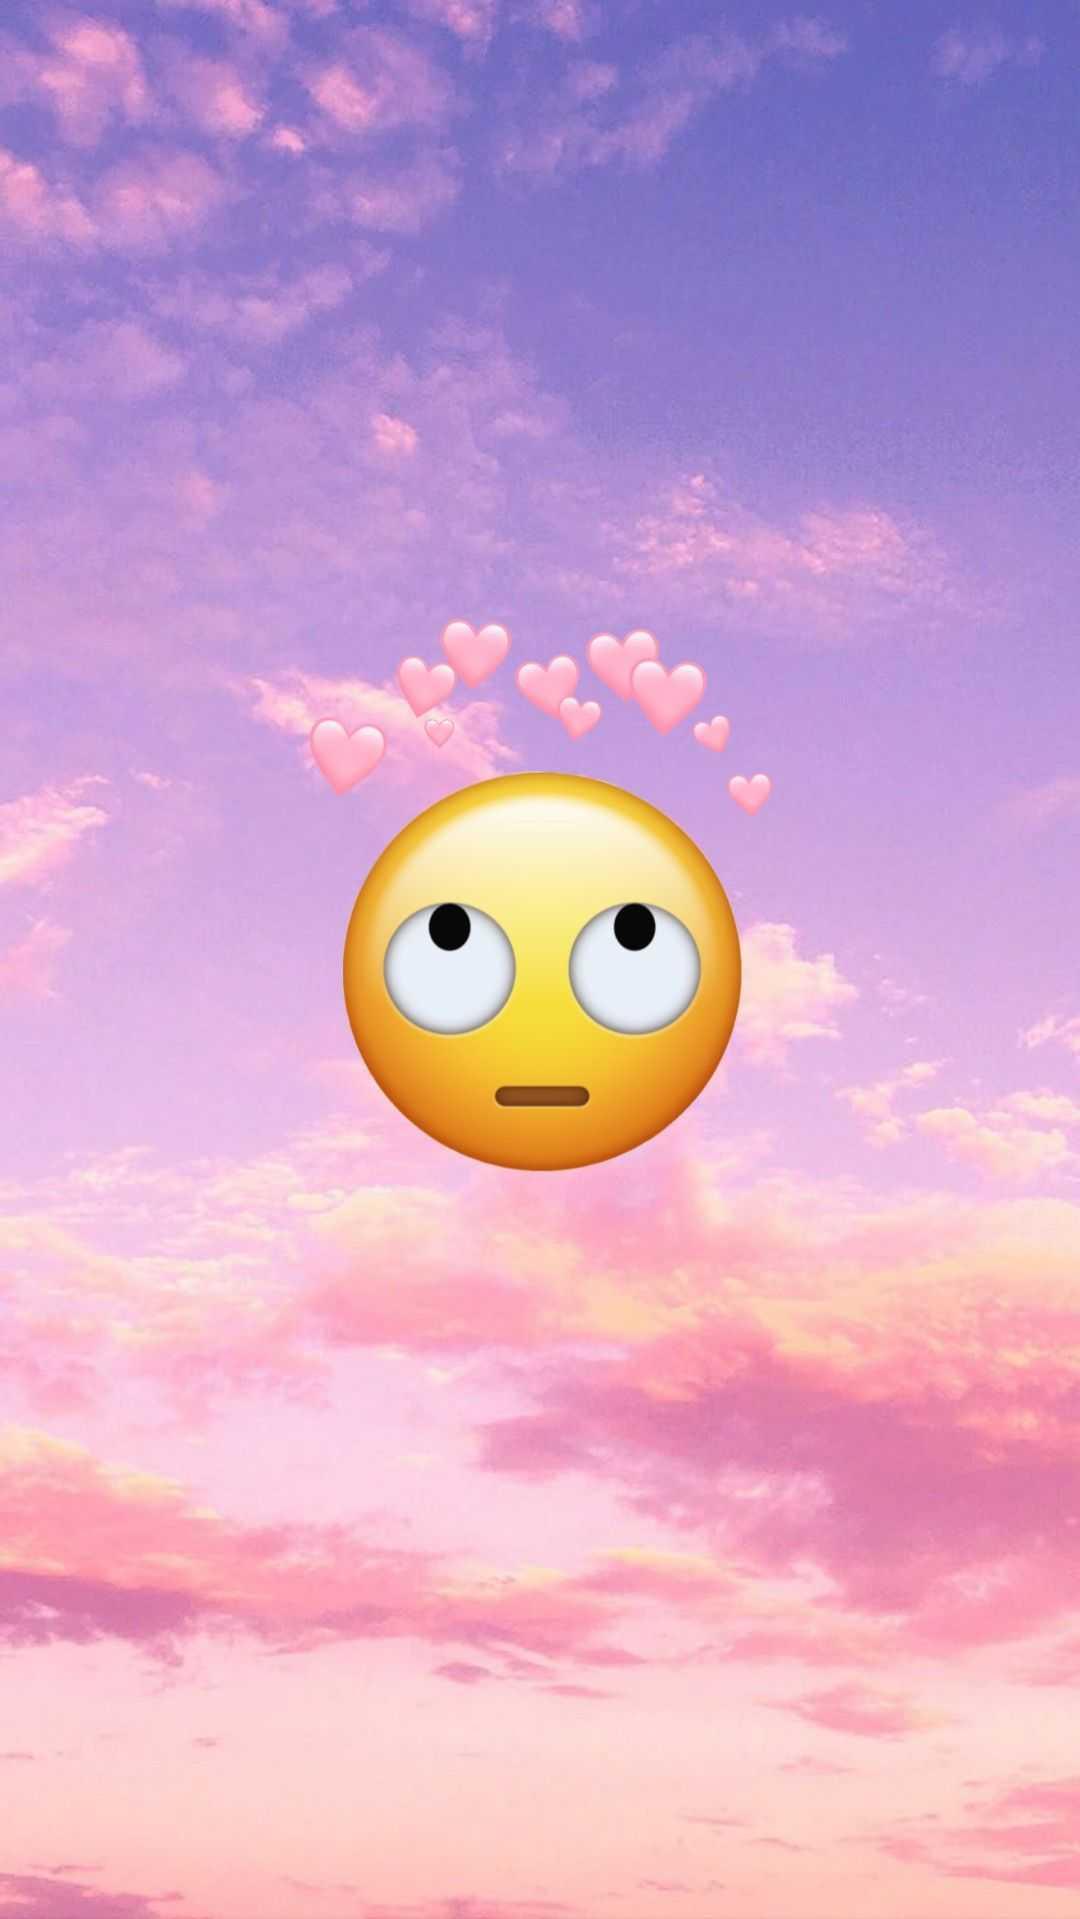 Emoji Wallpaper Kolpaper Awesome Free Hd Wallpapers